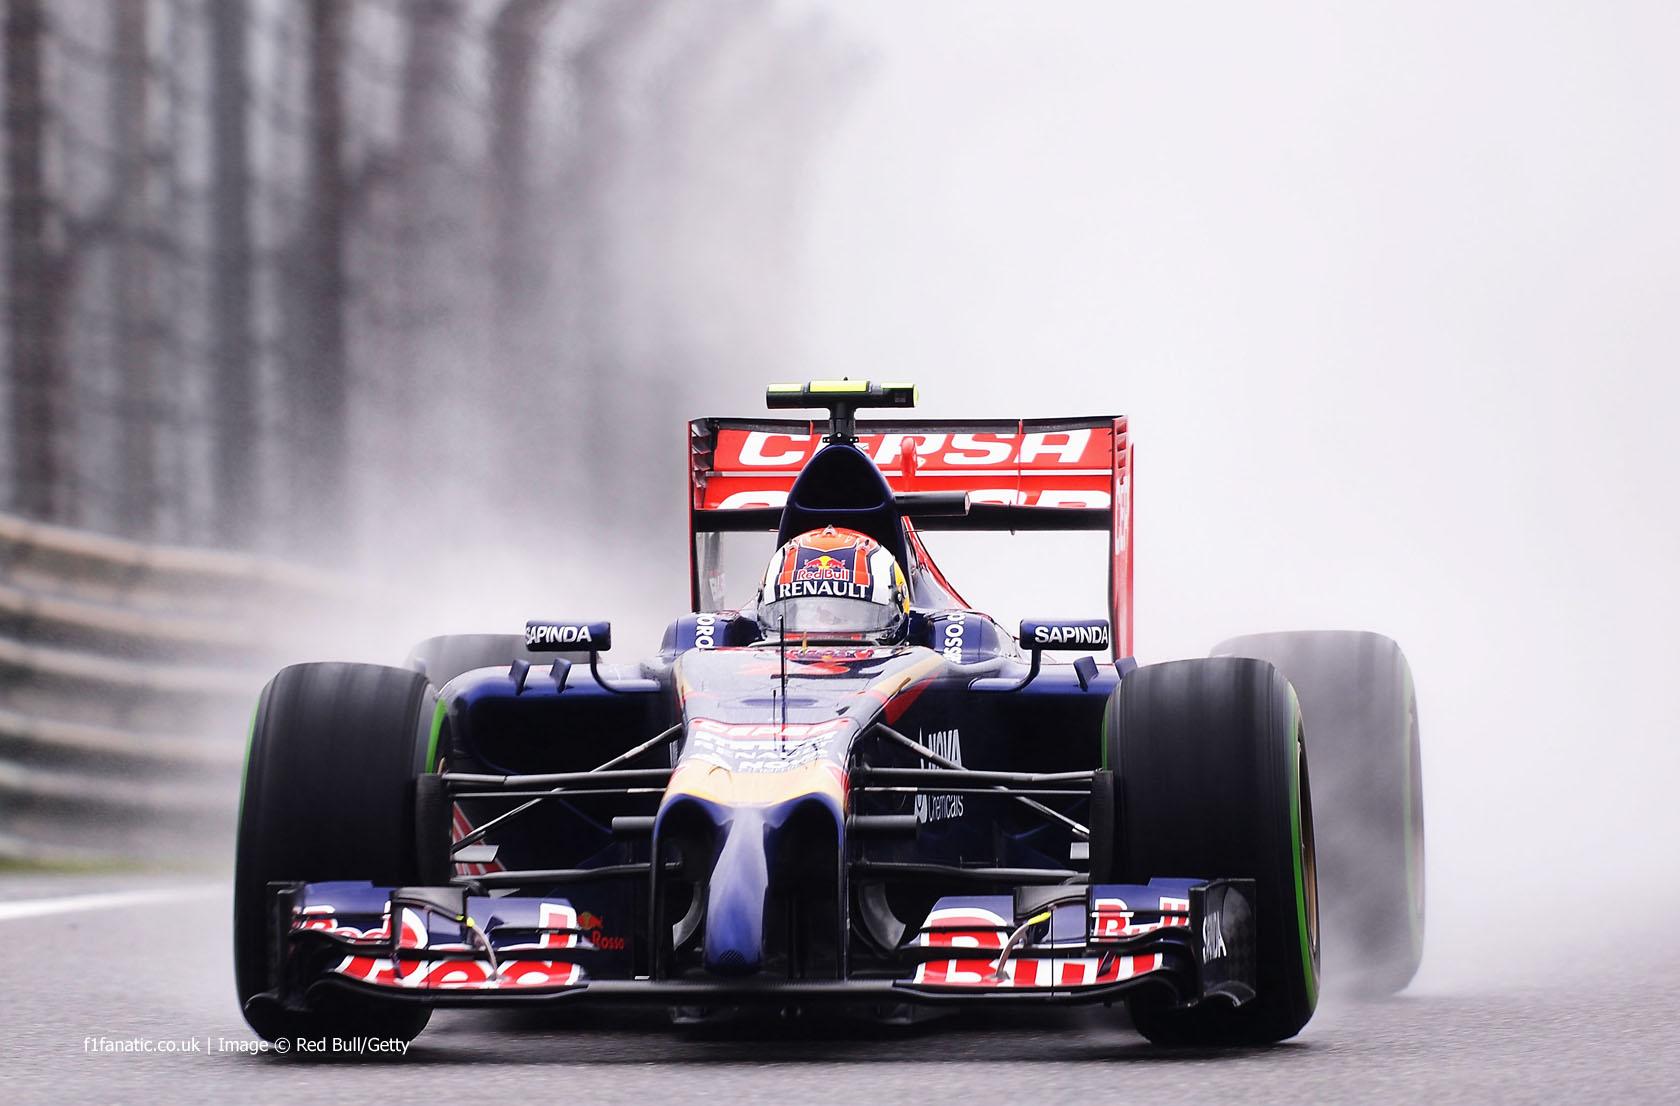 Daniil Kvyat, Toro Rosso, Shanghai International Circuit, 2014